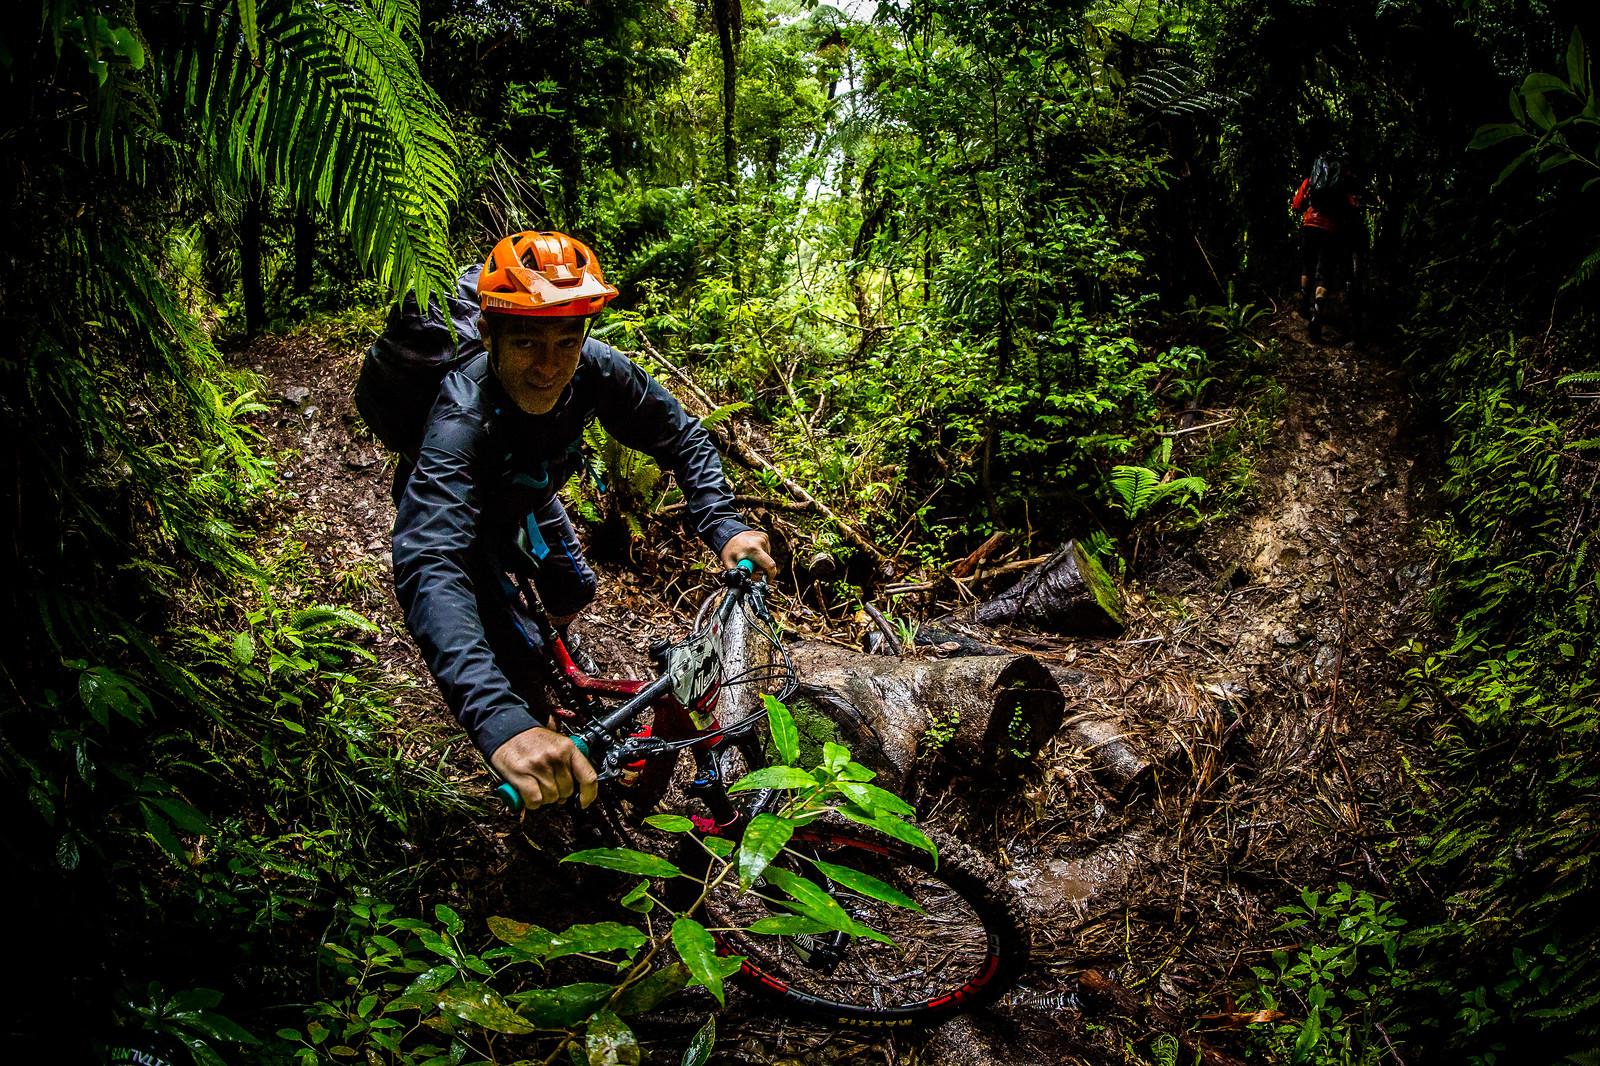 NZ Enduro Weather - NZ Enduro Day 2 - Mountain Biking Pictures - Vital MTB